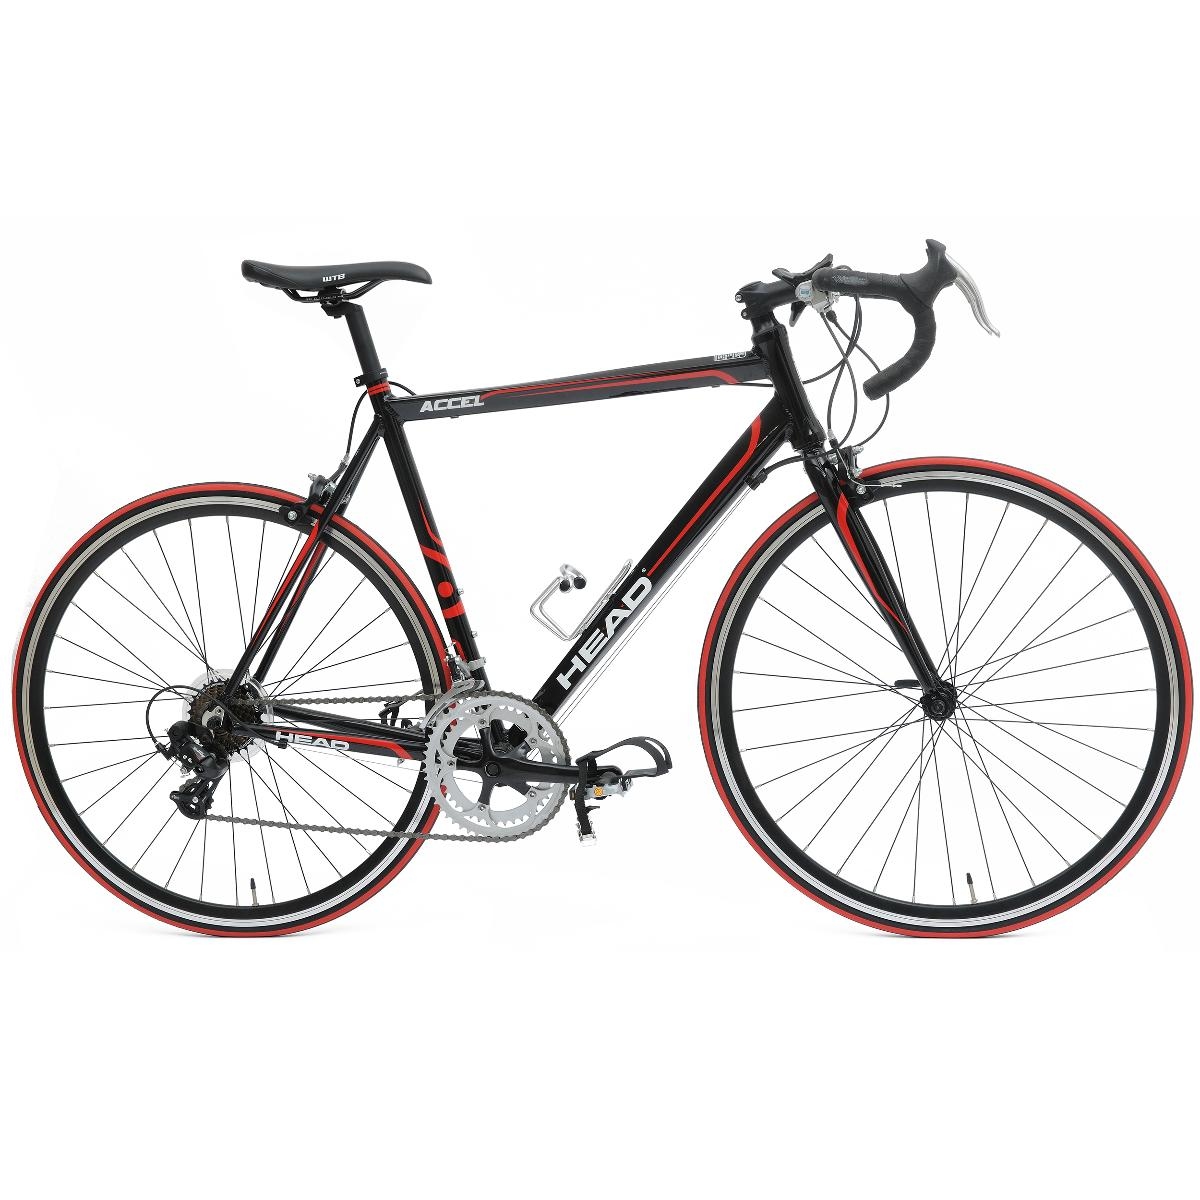 Accel X 700C Road Bicycle 55 cm